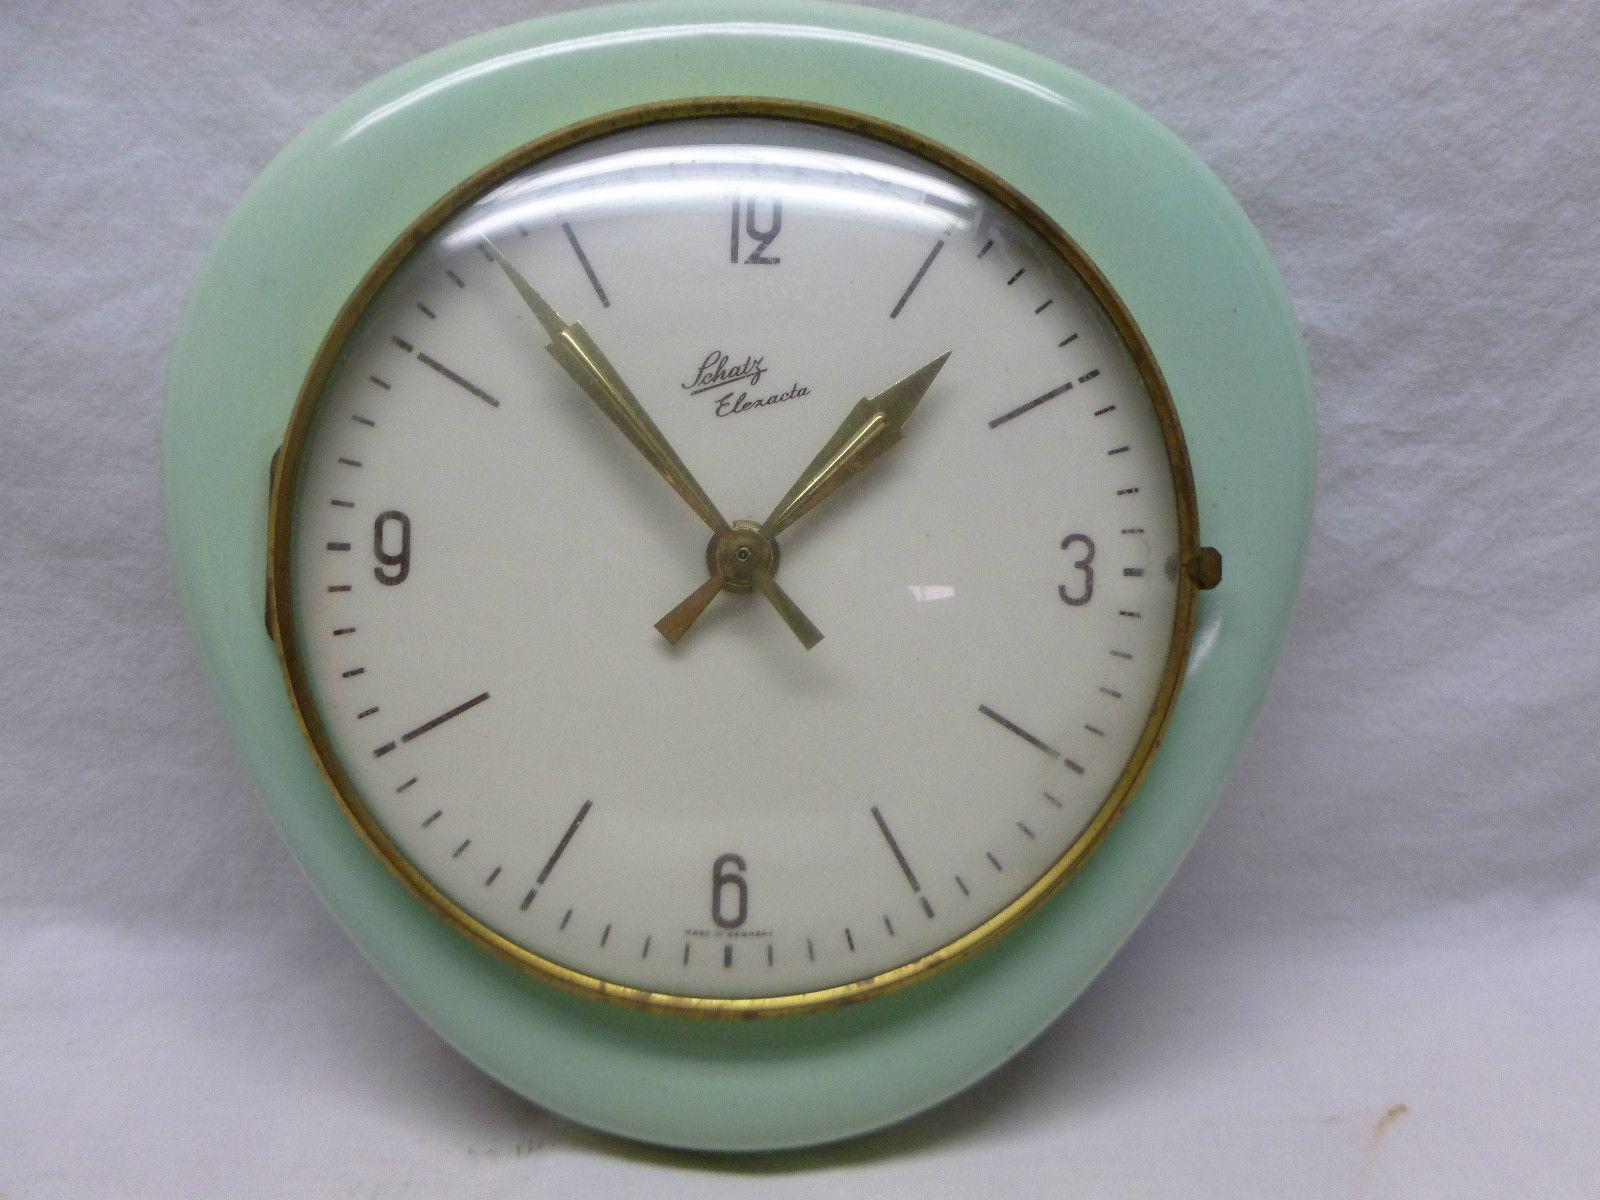 Elexacta Clocks